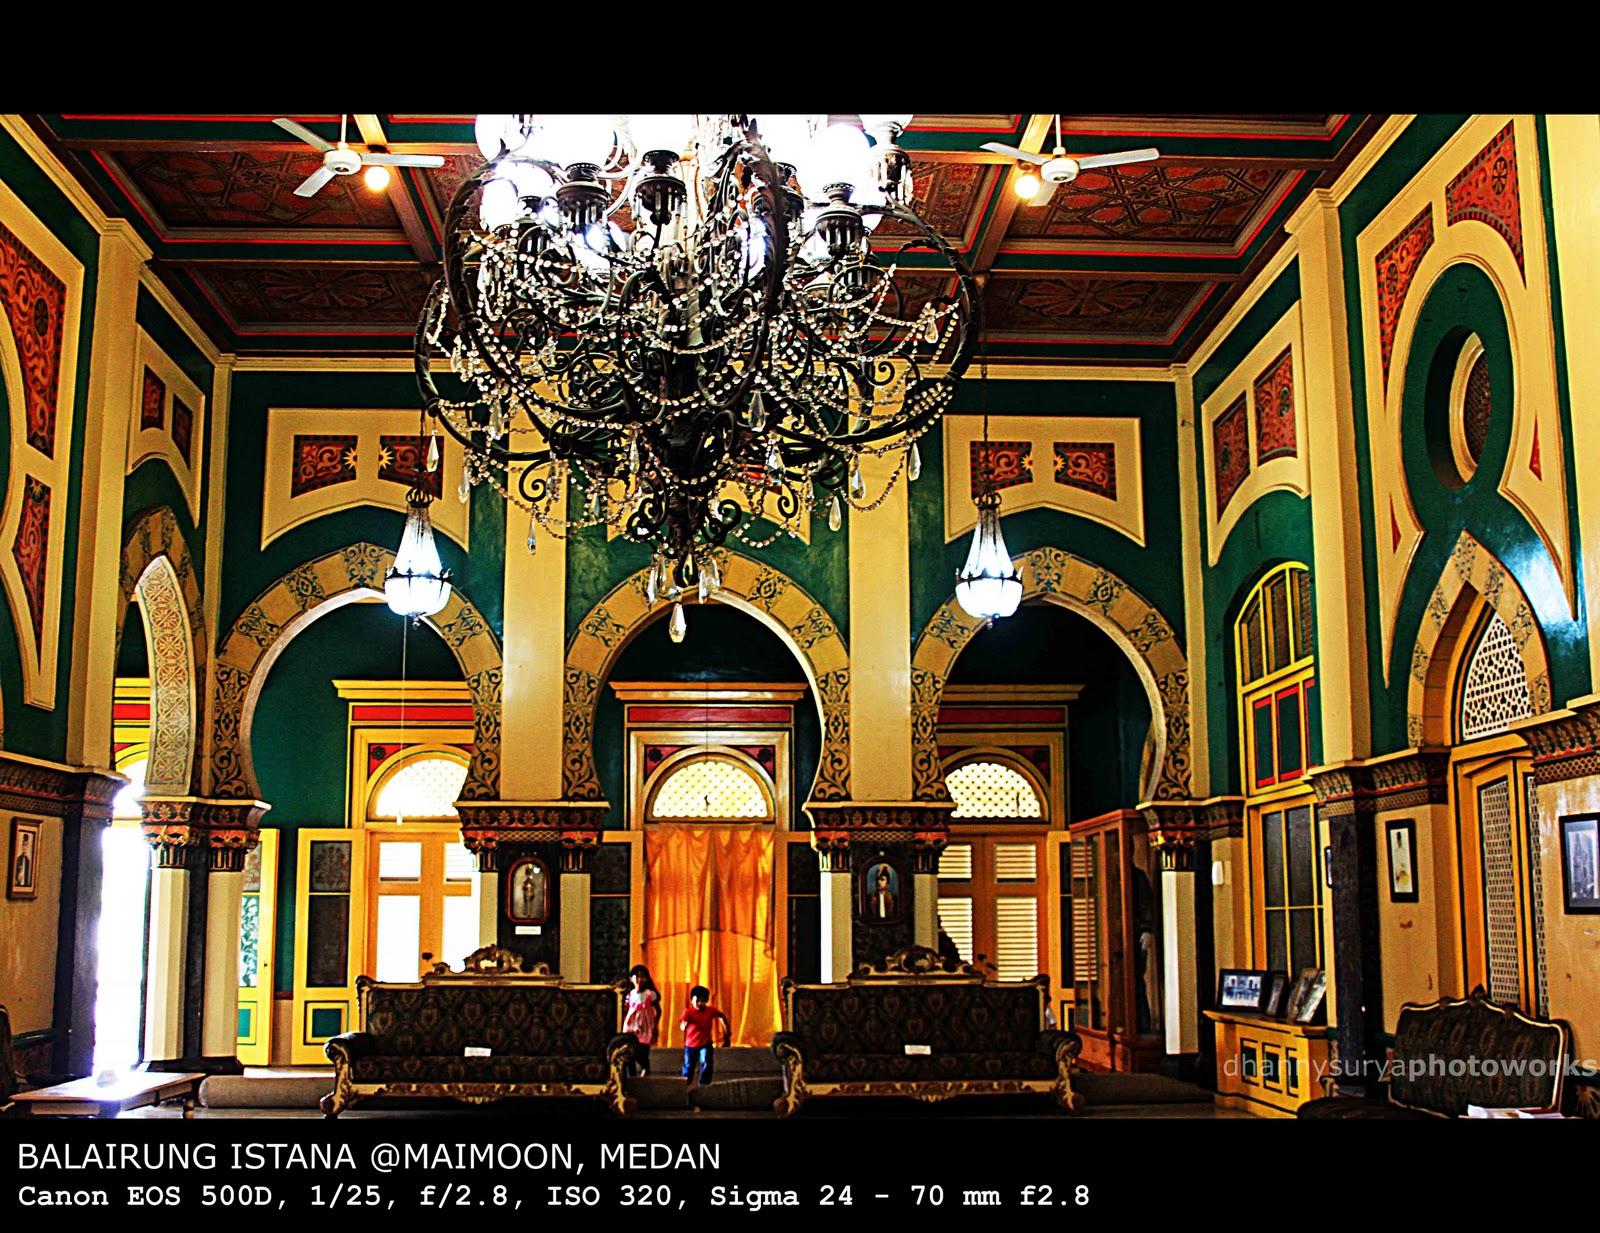 dhannysurya PHOTOBLOG: Istana Maimoon Medan